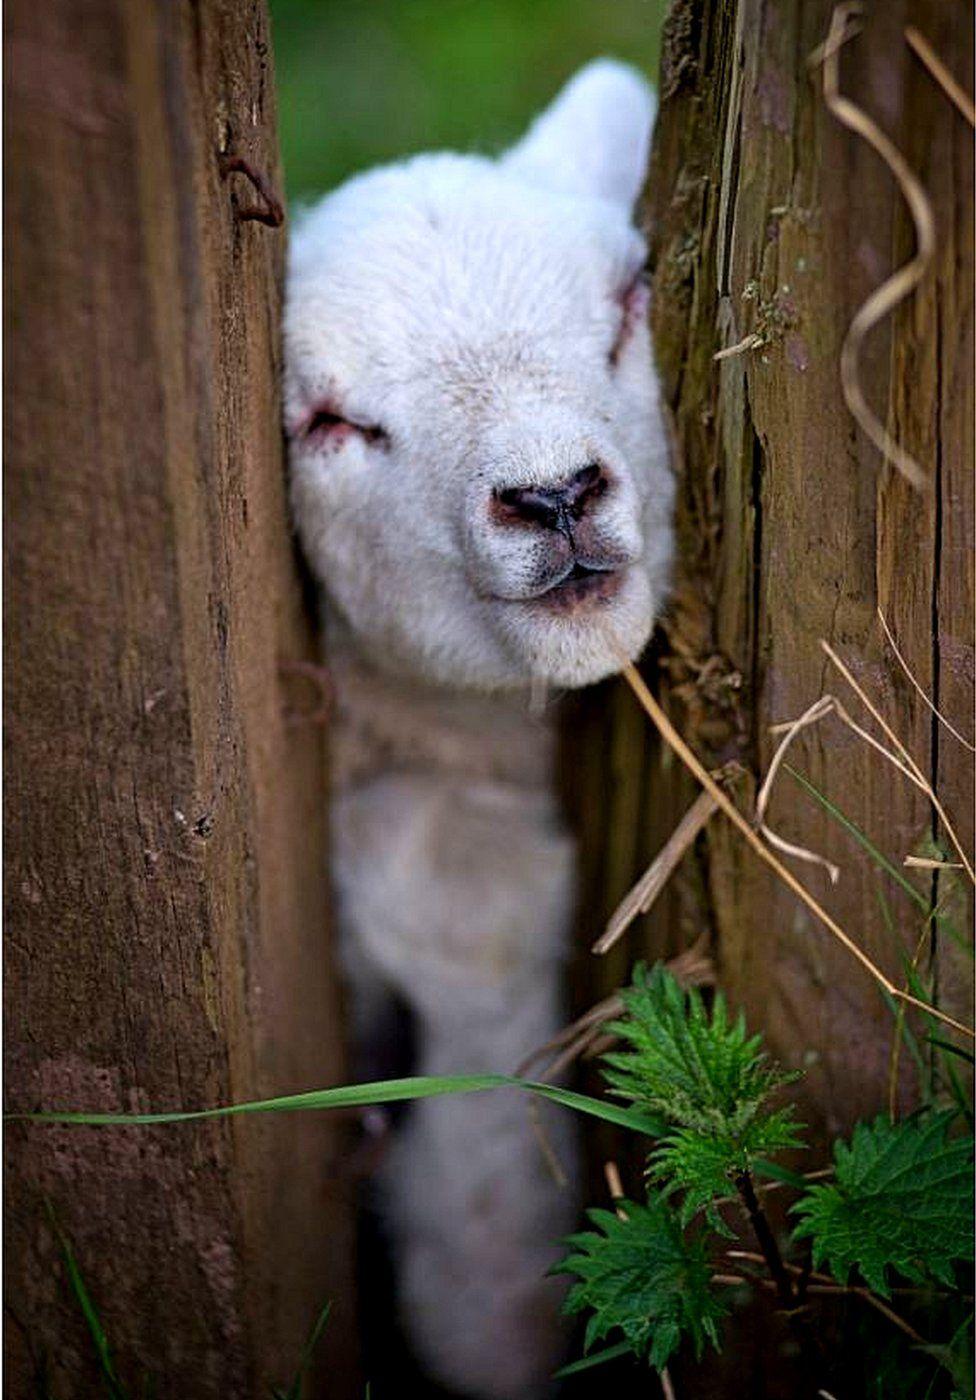 lamb in a jam